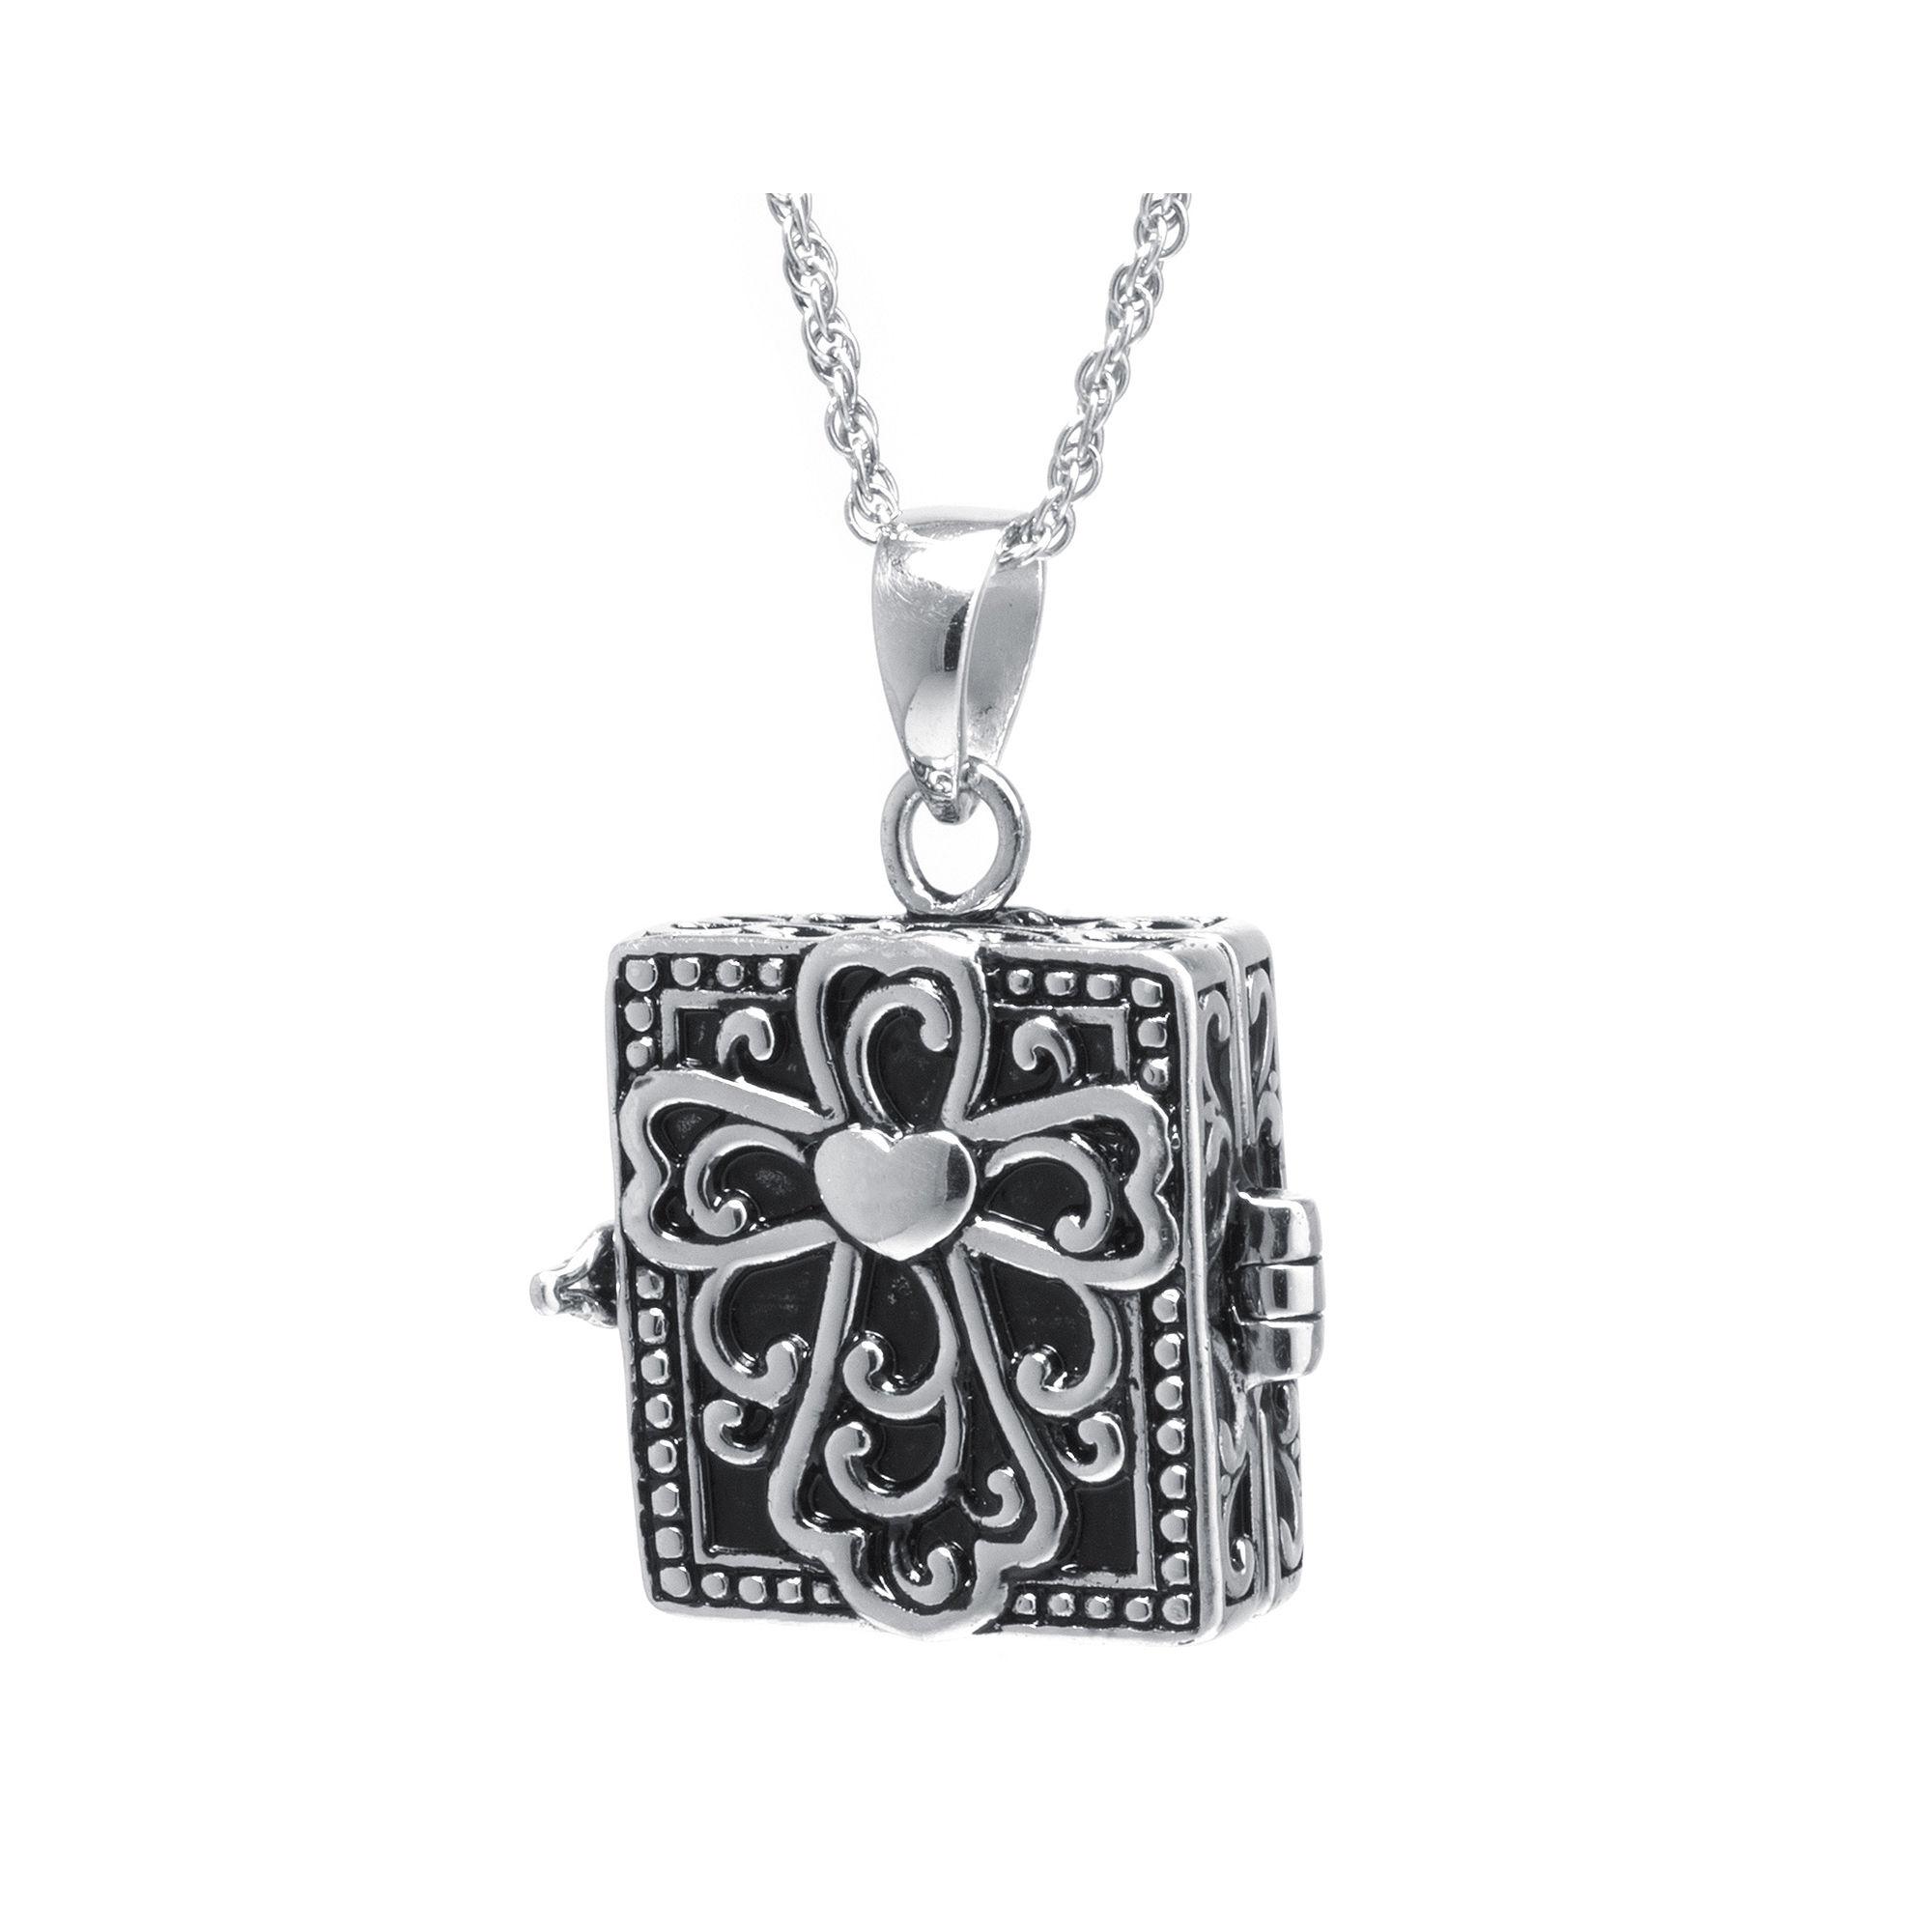 Sterling Silver Vintage Square Cross Prayer Box Pendant Necklace